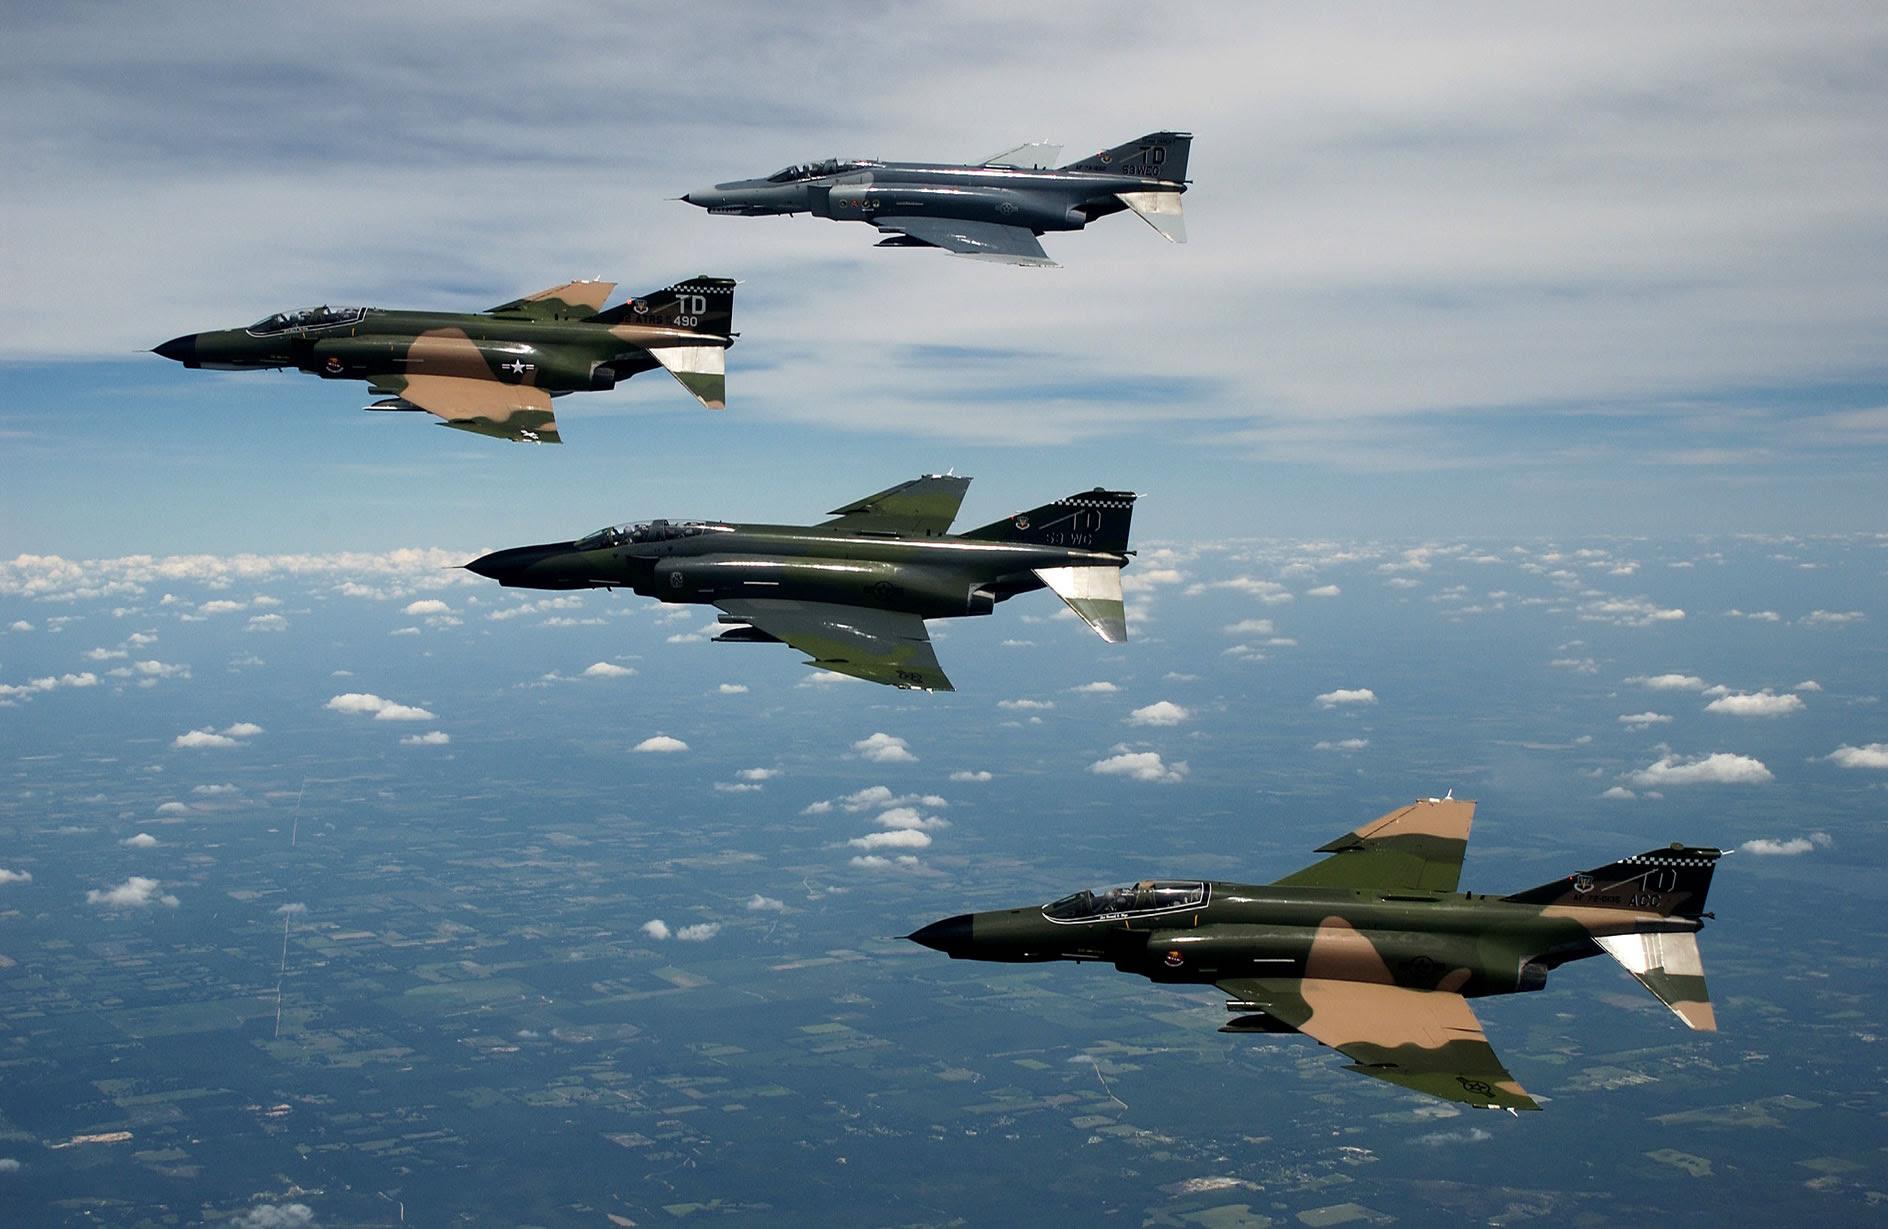 http://www.aviationexplorer.com/mil_photos_for_windows_desktop/images/f4_formation_jpg.jpg